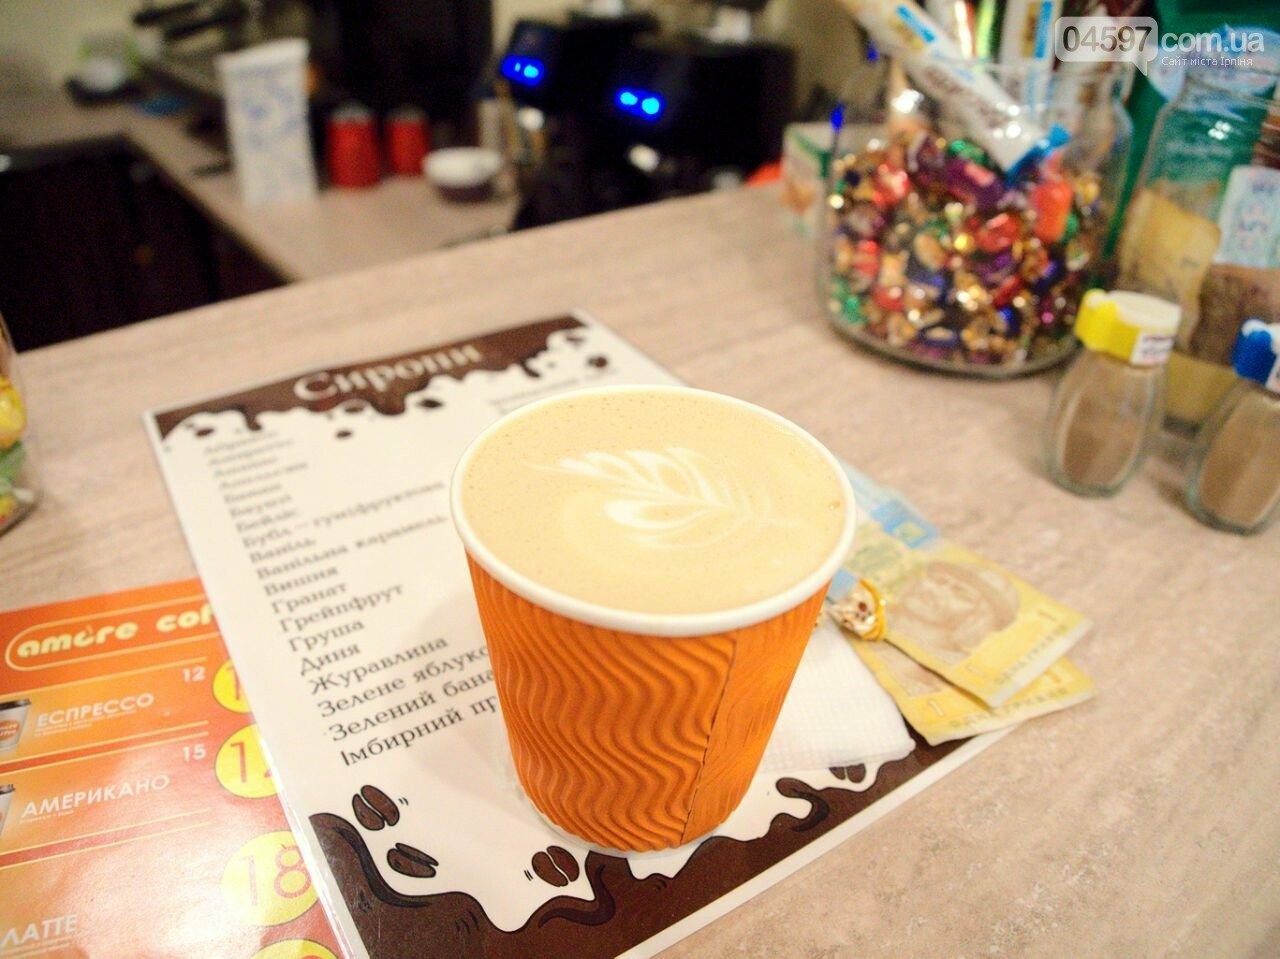 Аmore coffee - смачна кава в Ірпені!, фото-3